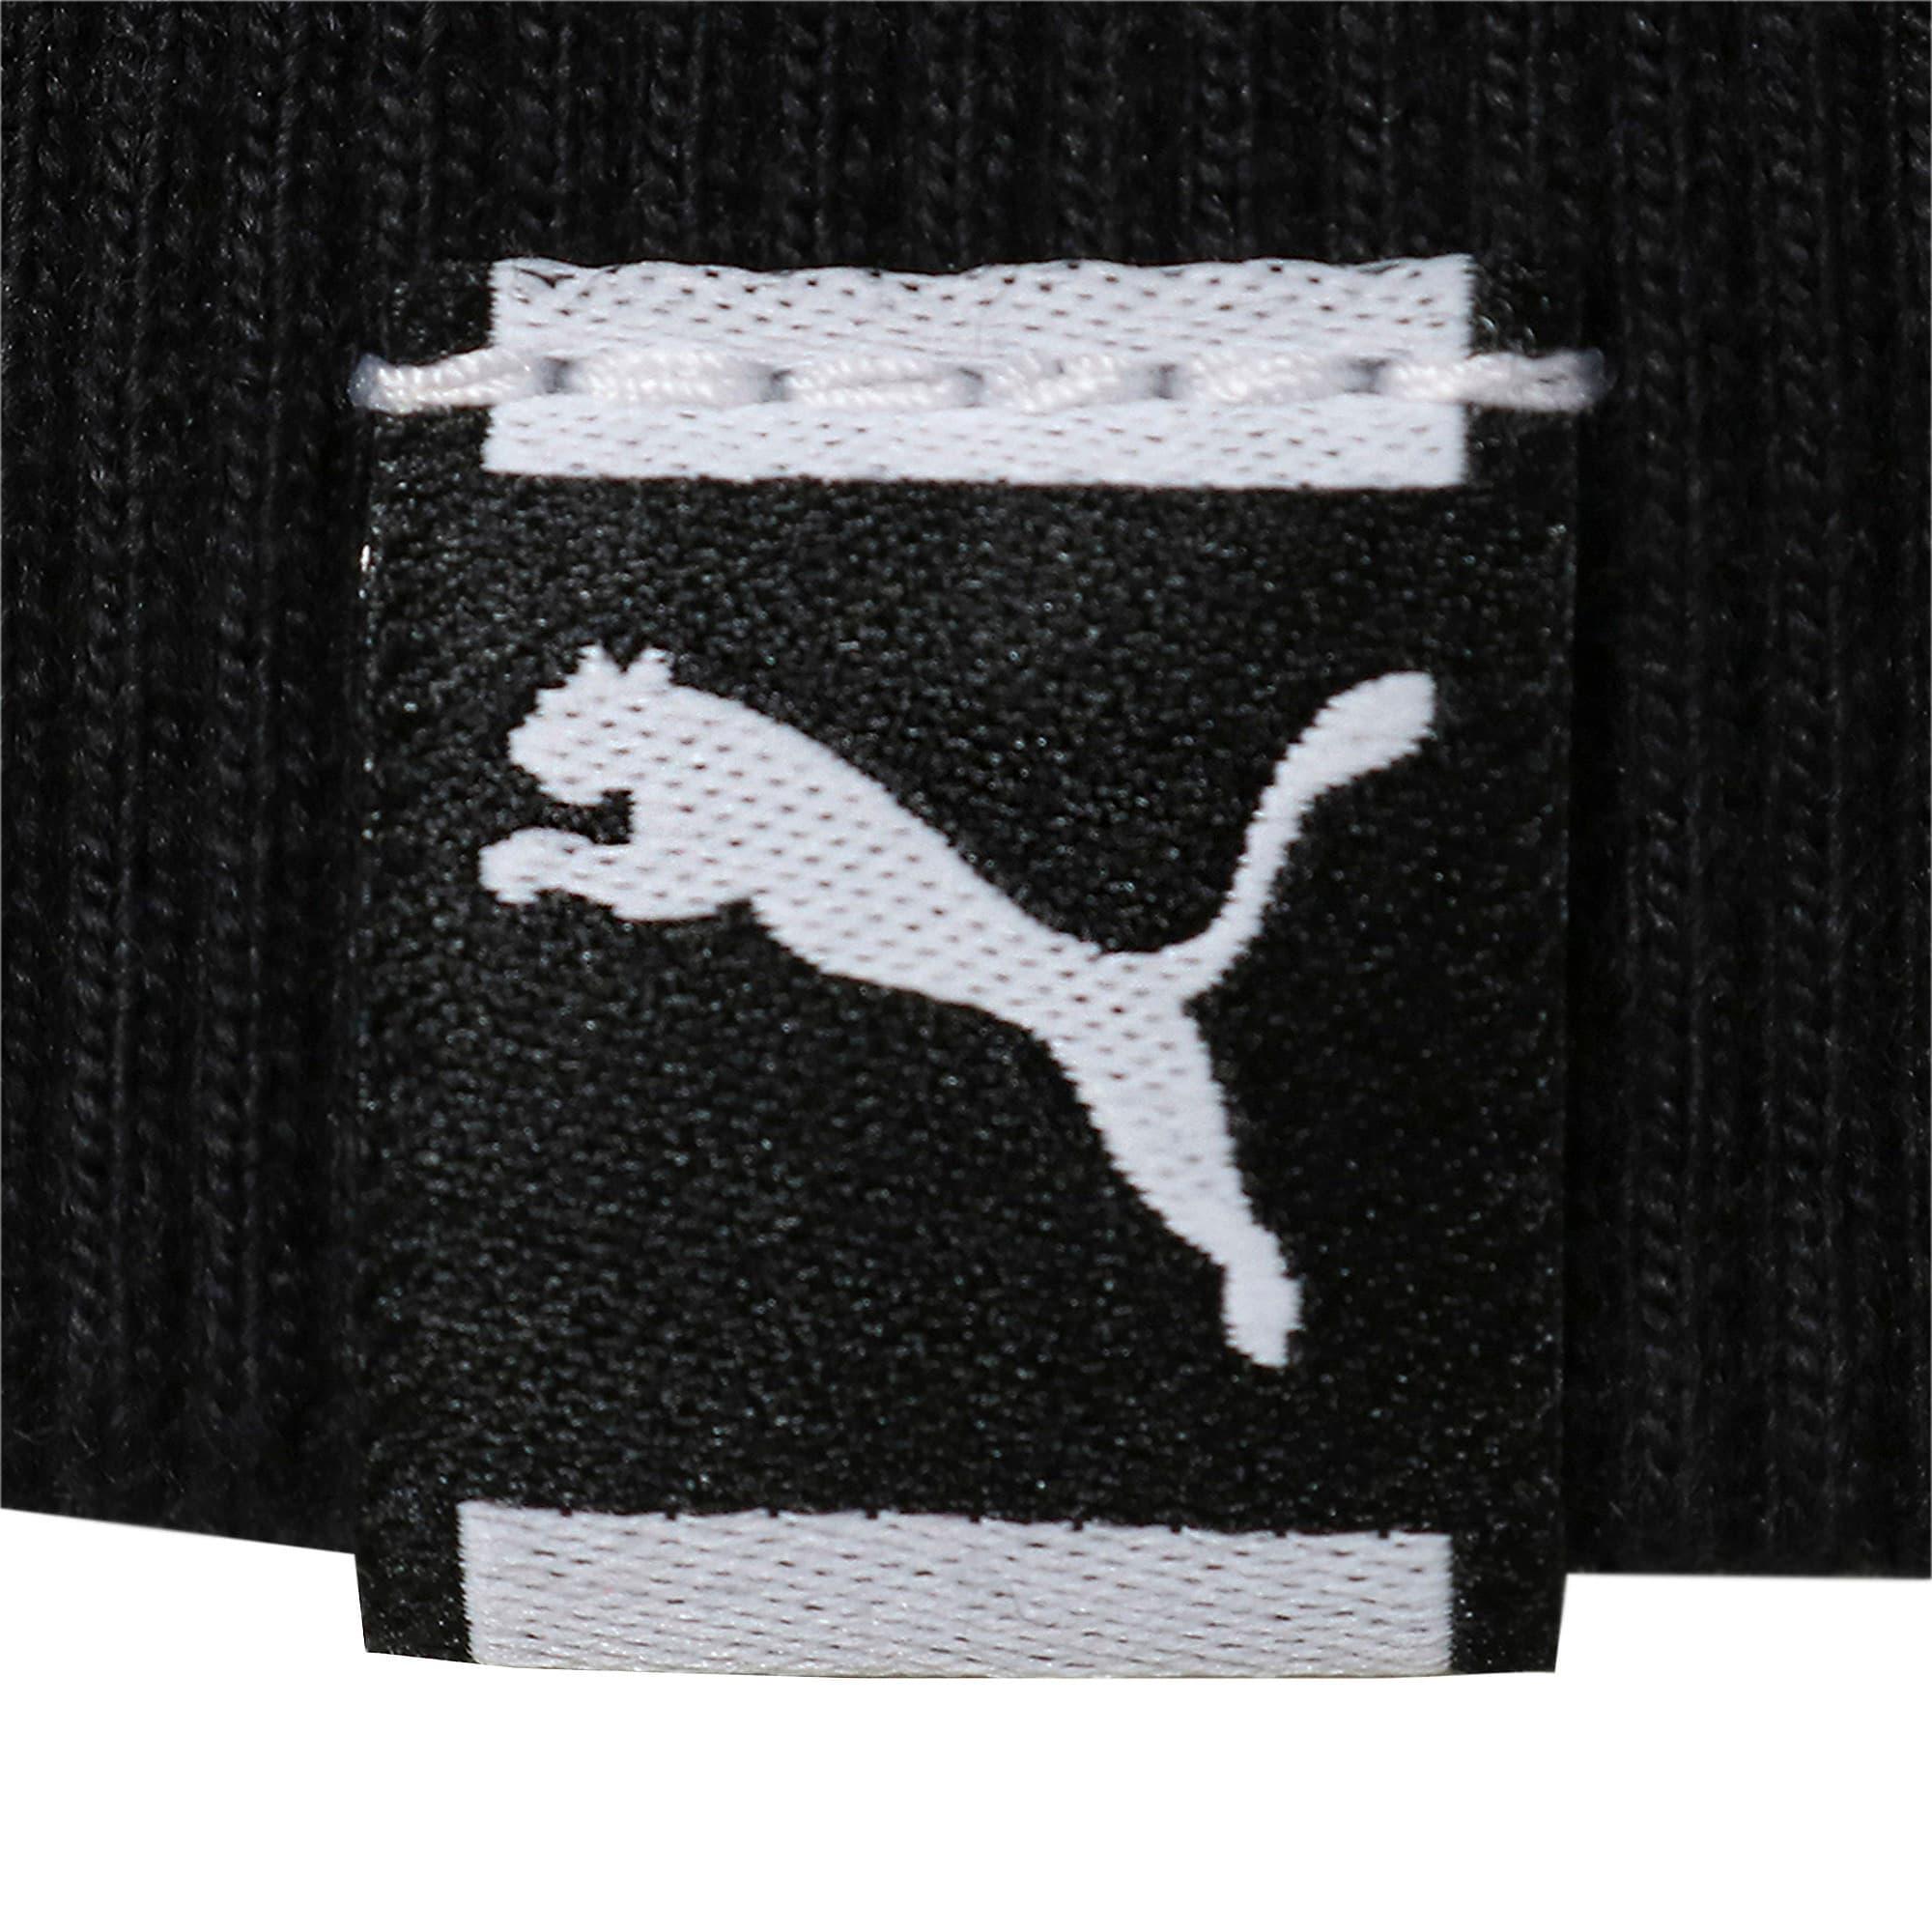 Thumbnail 10 of ダウンタウン クルースウェット, Puma Black, medium-JPN